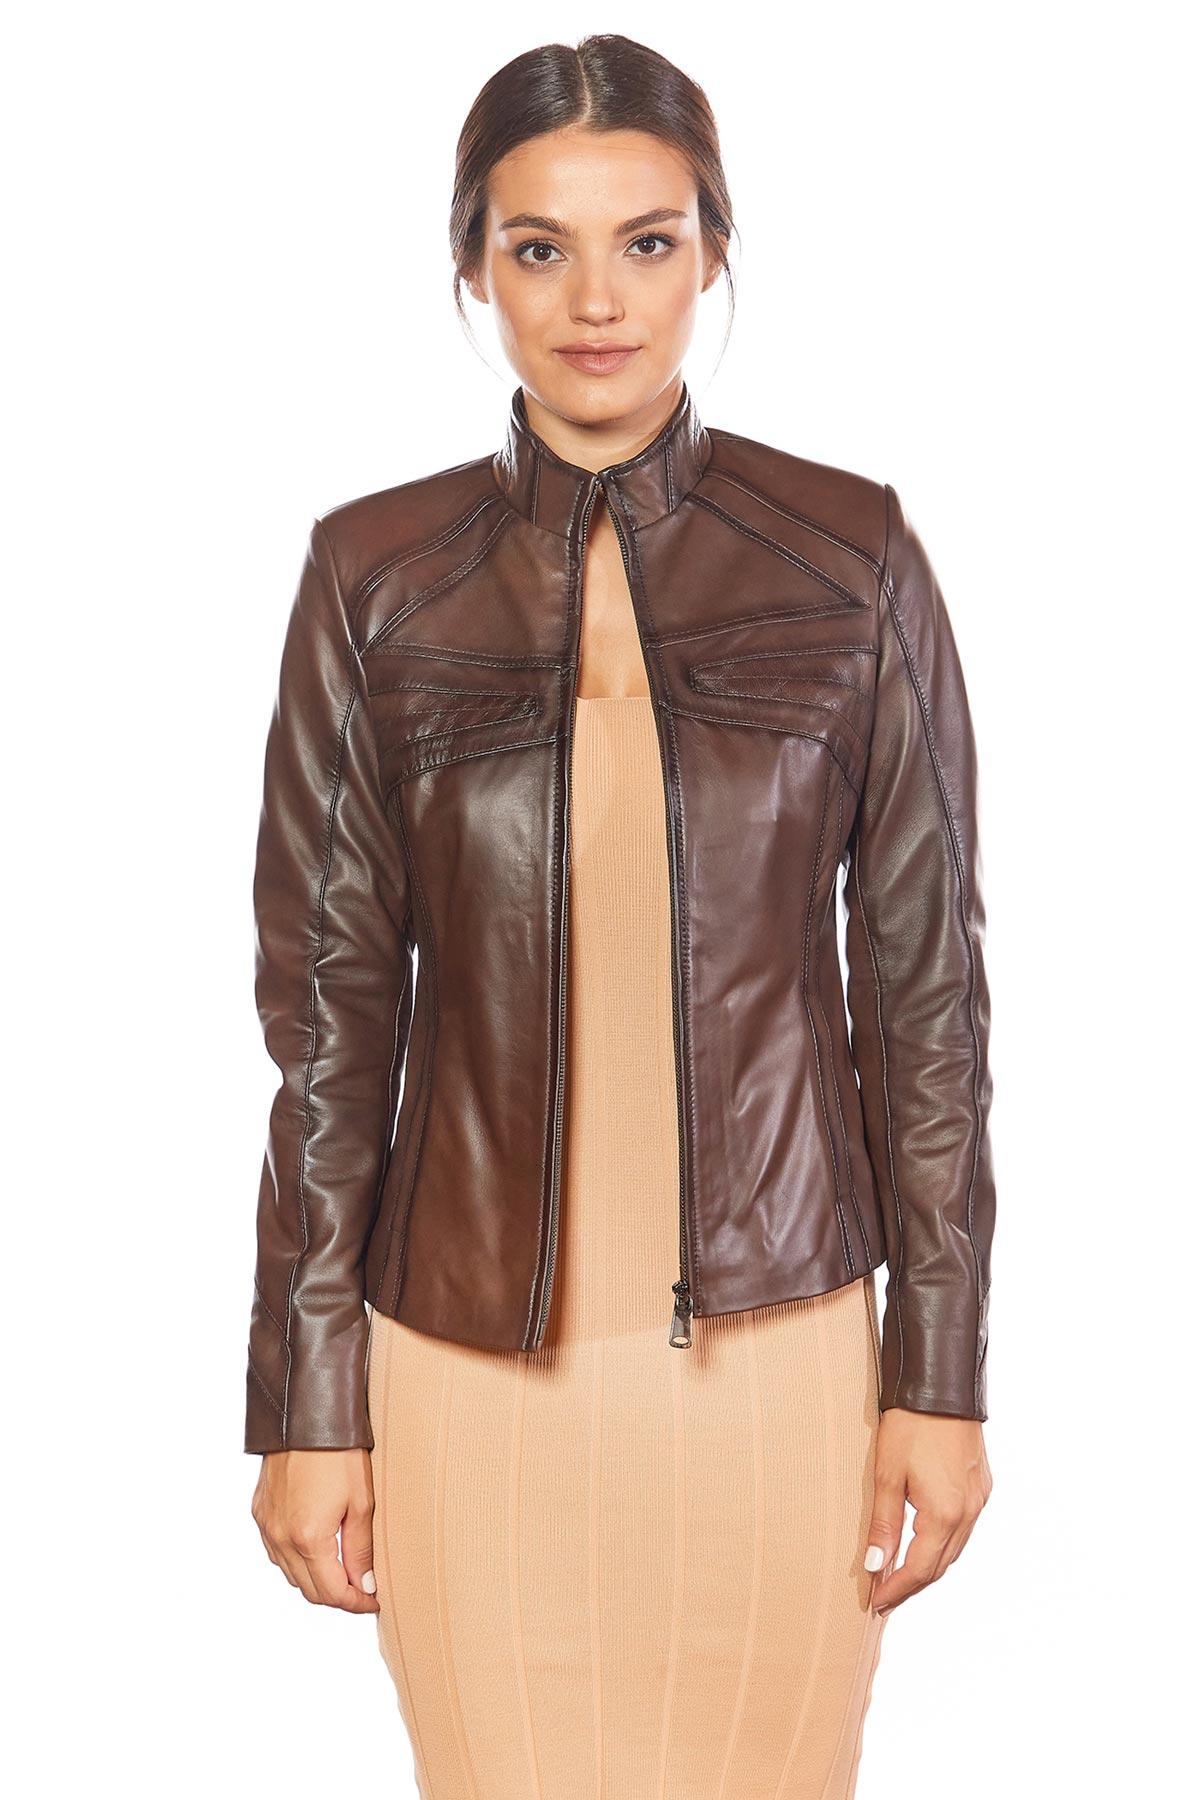 5 star leather jacket